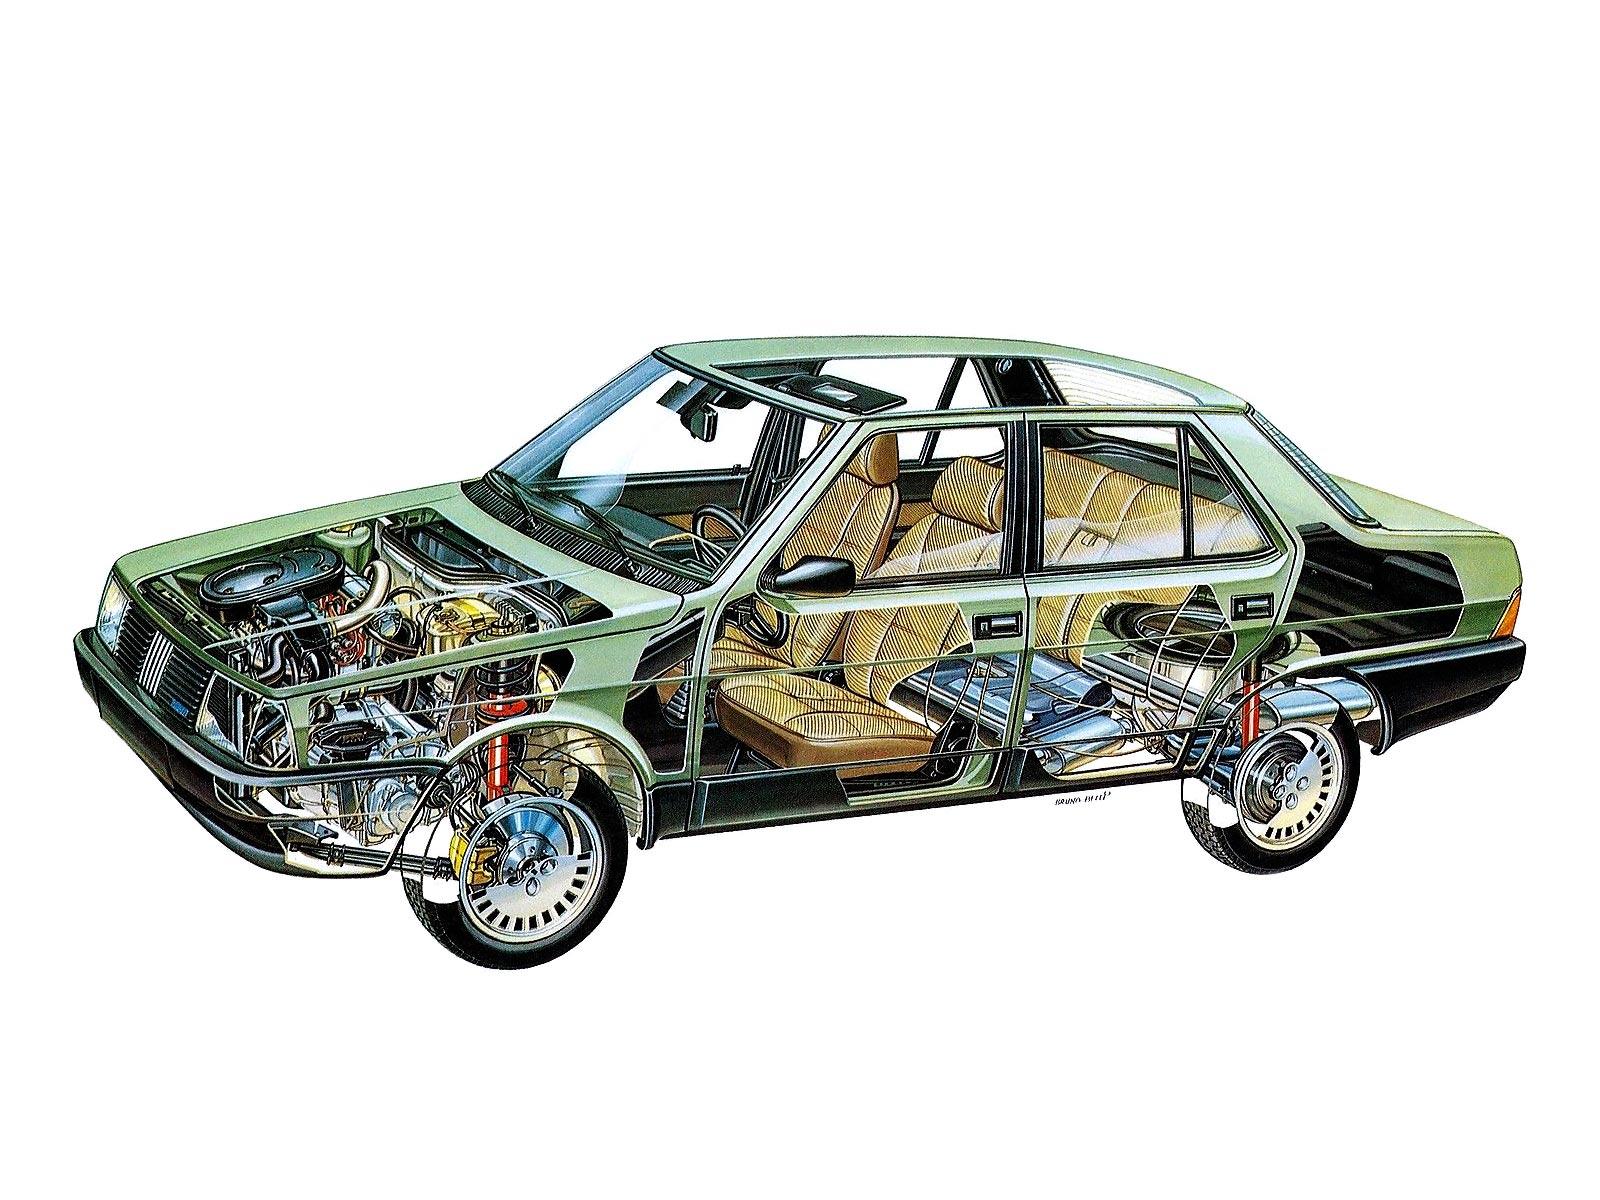 Fiat Regata Super cutaway drawing